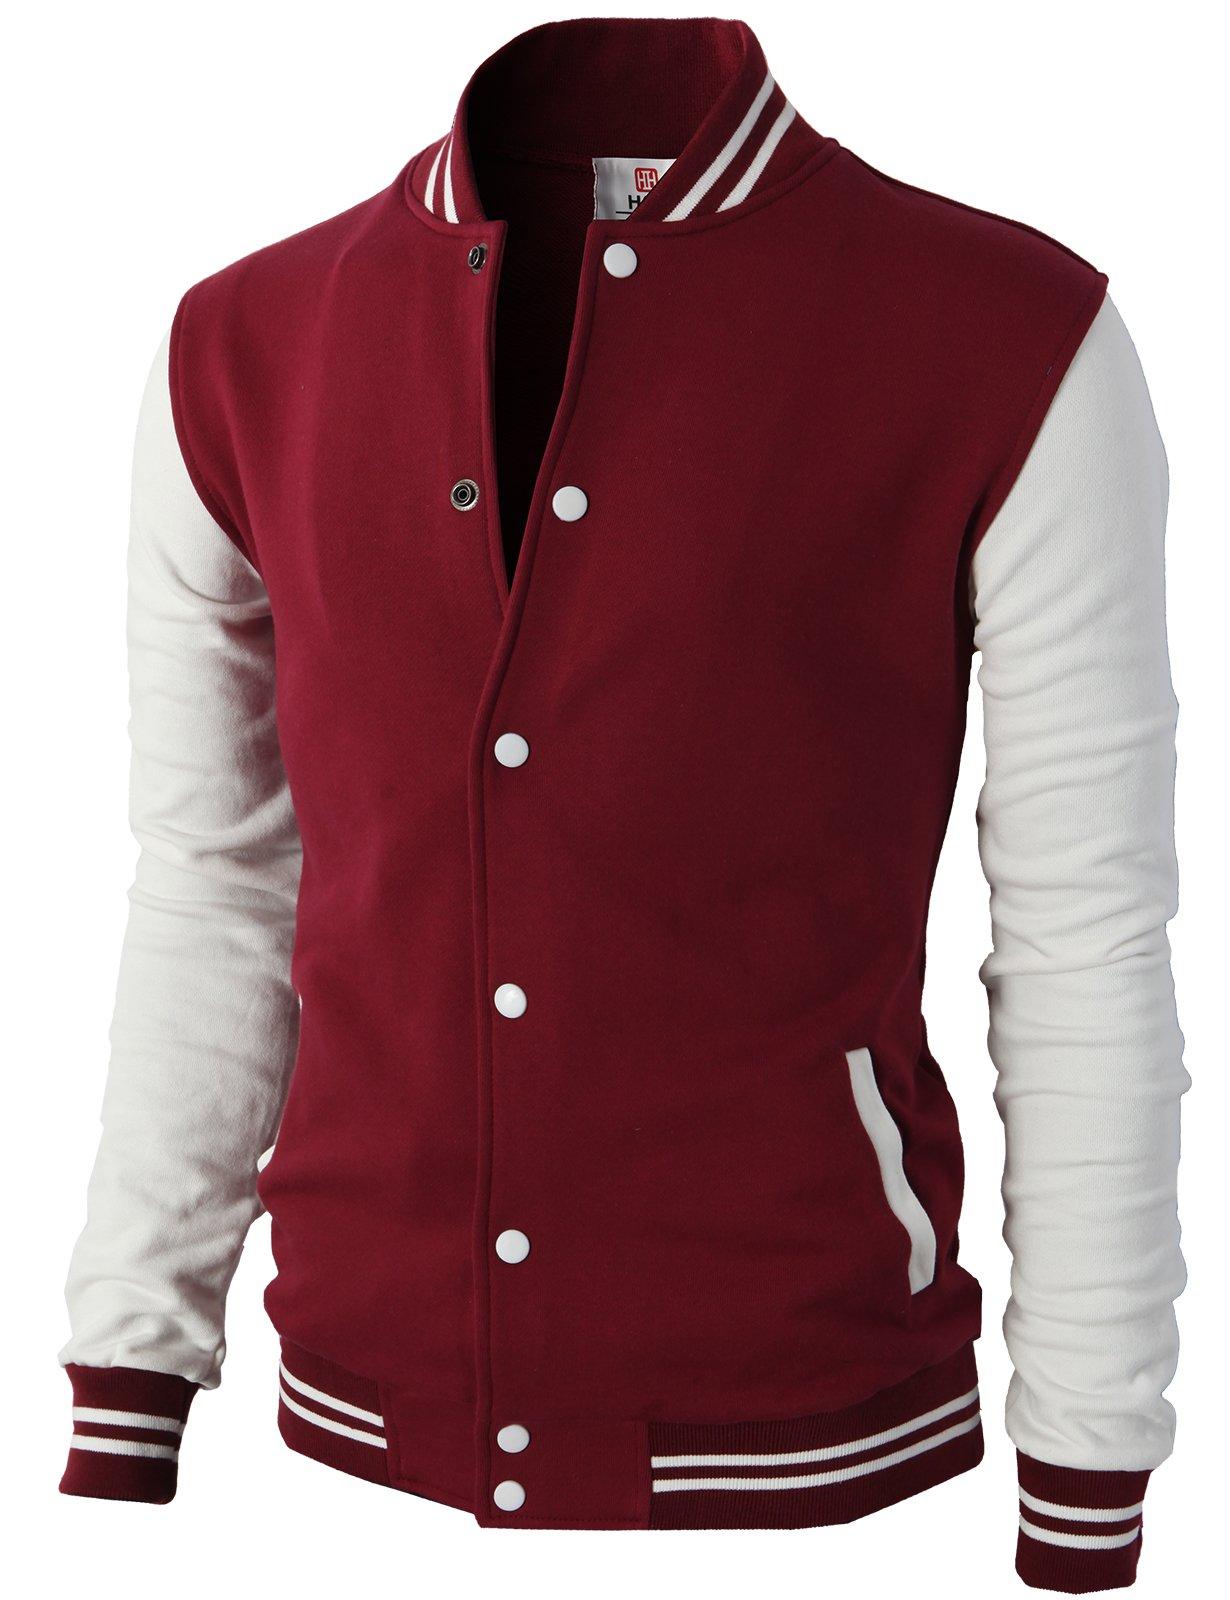 H2H Mens Slim Fit Varsity Baseball Bomber Cotton Lightweight Premium Jacket  Cmoja083-wine XX-Large by H2H